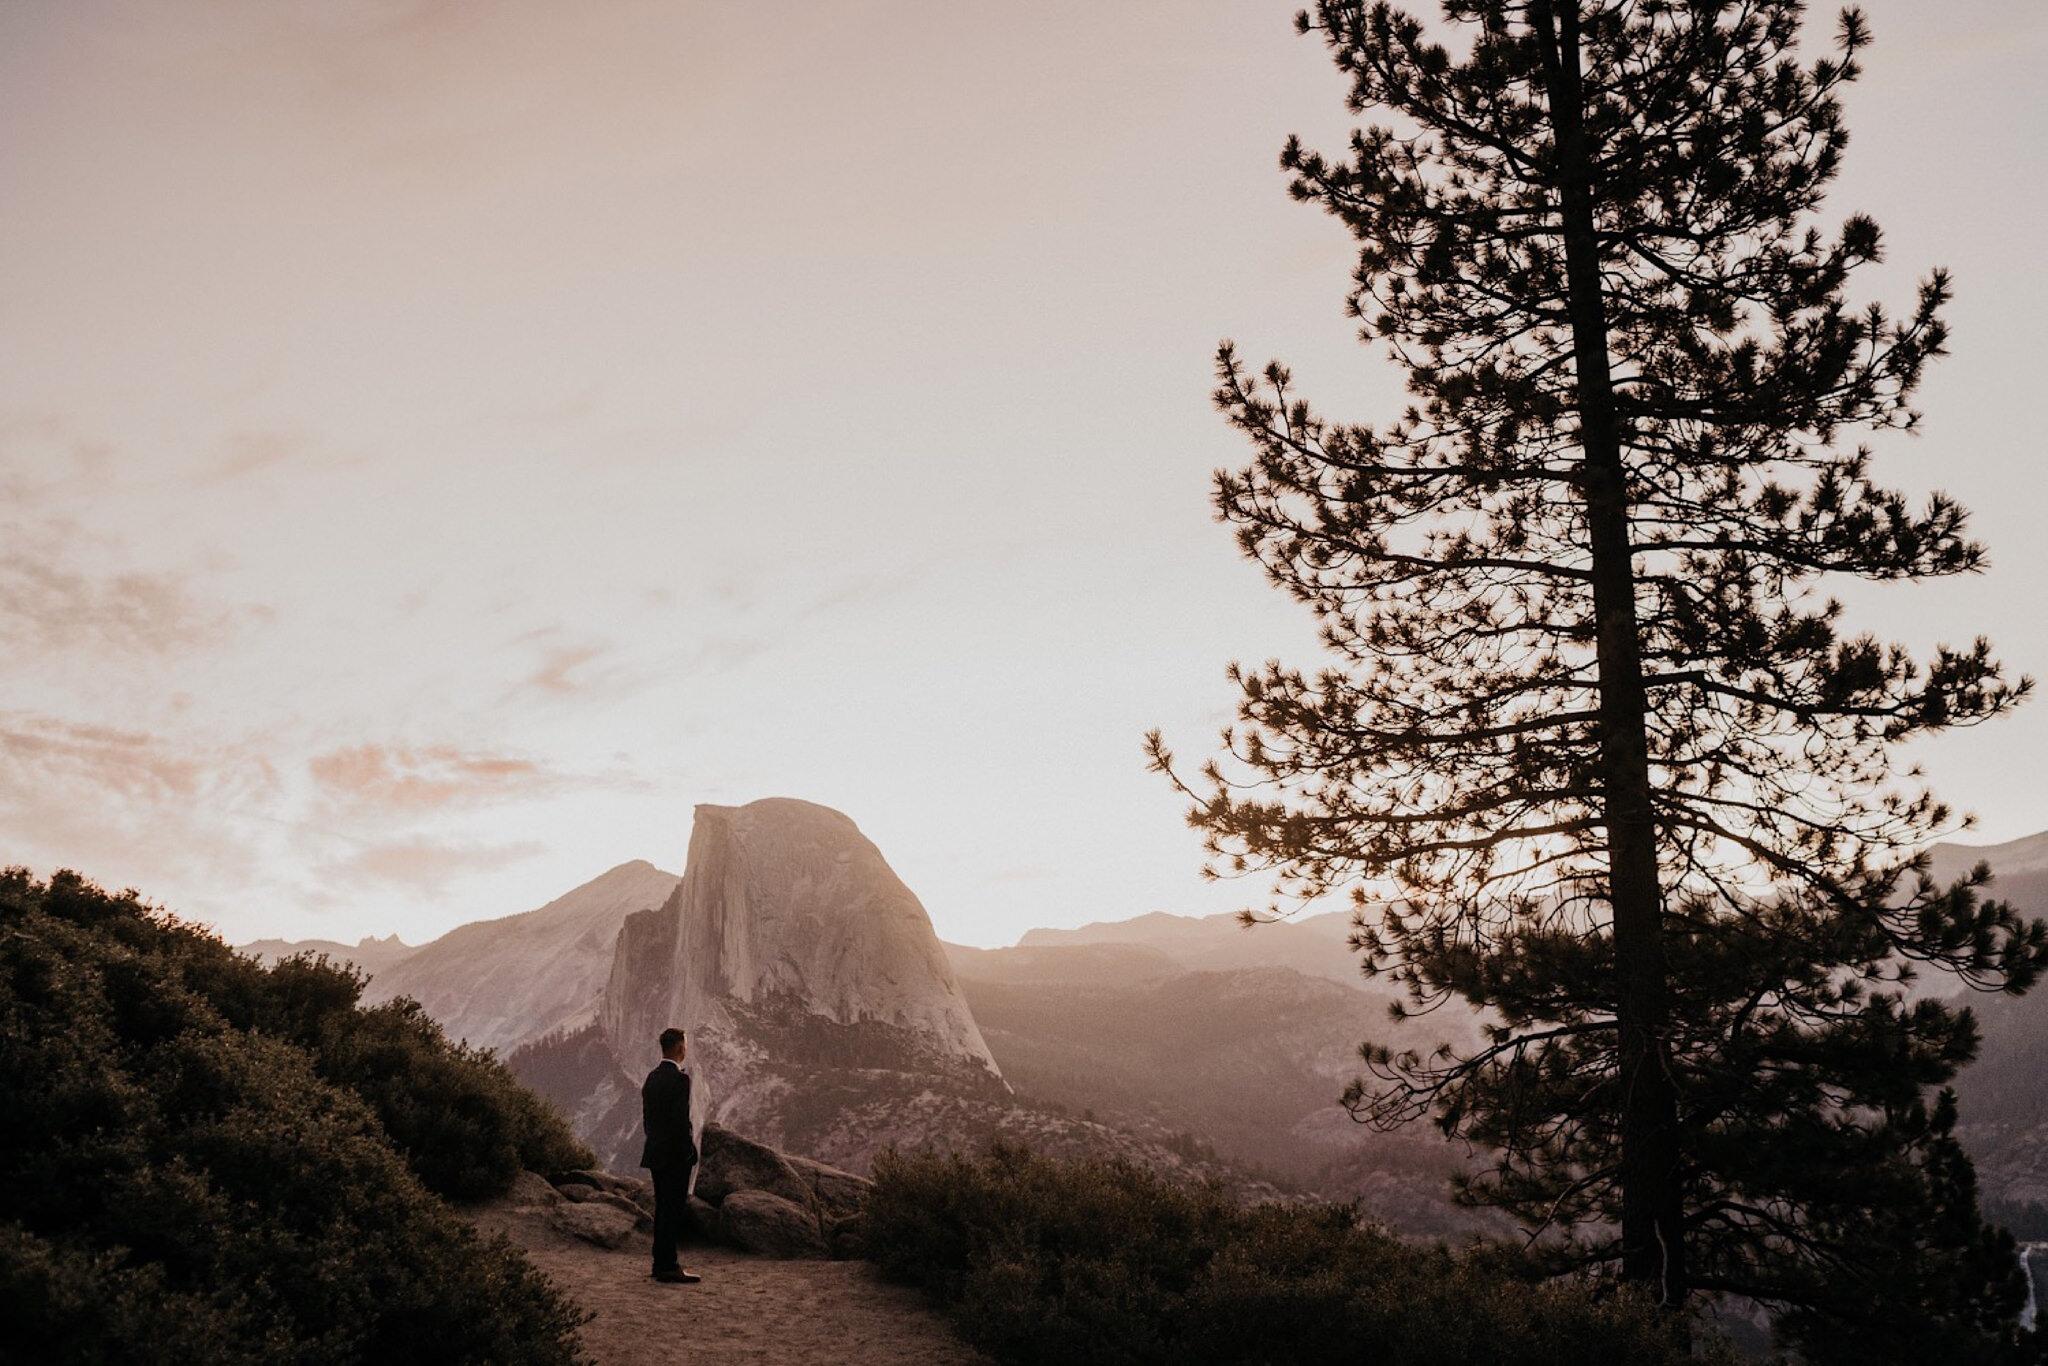 Yosemite-Adventure-Elopement-Taft-Glacier-Point-4.jpg